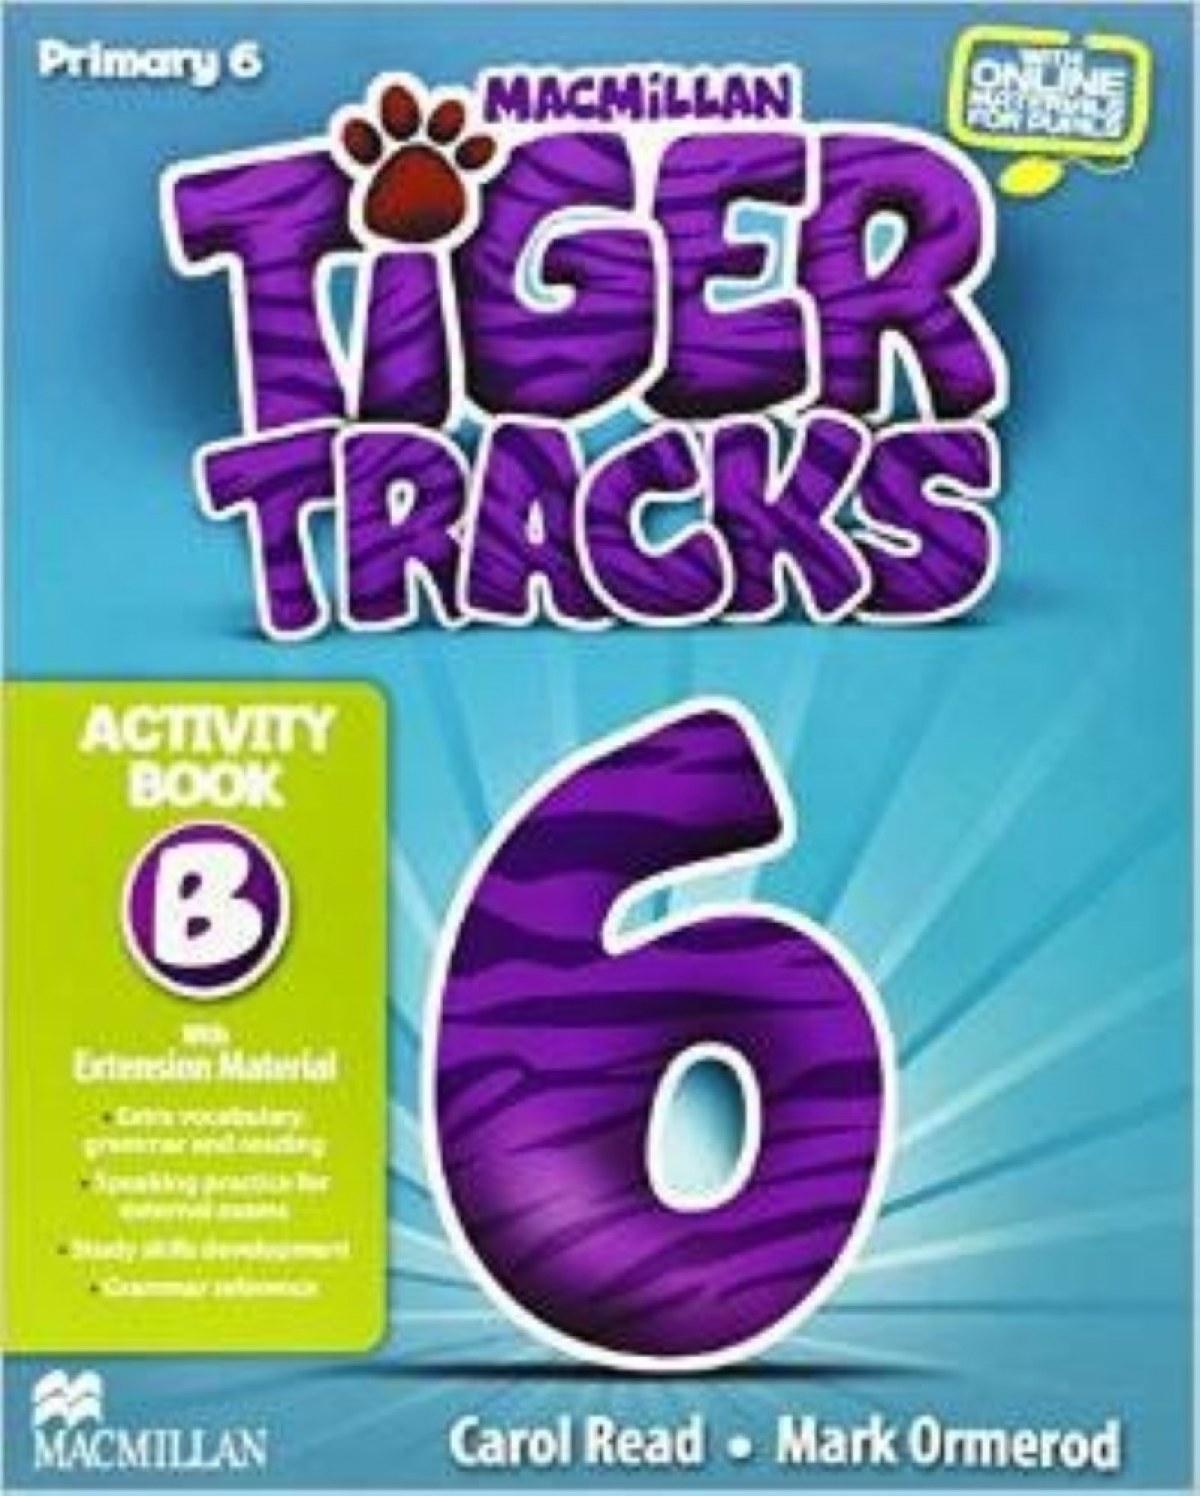 Tiger 6 *B* activity pack 9780230453647